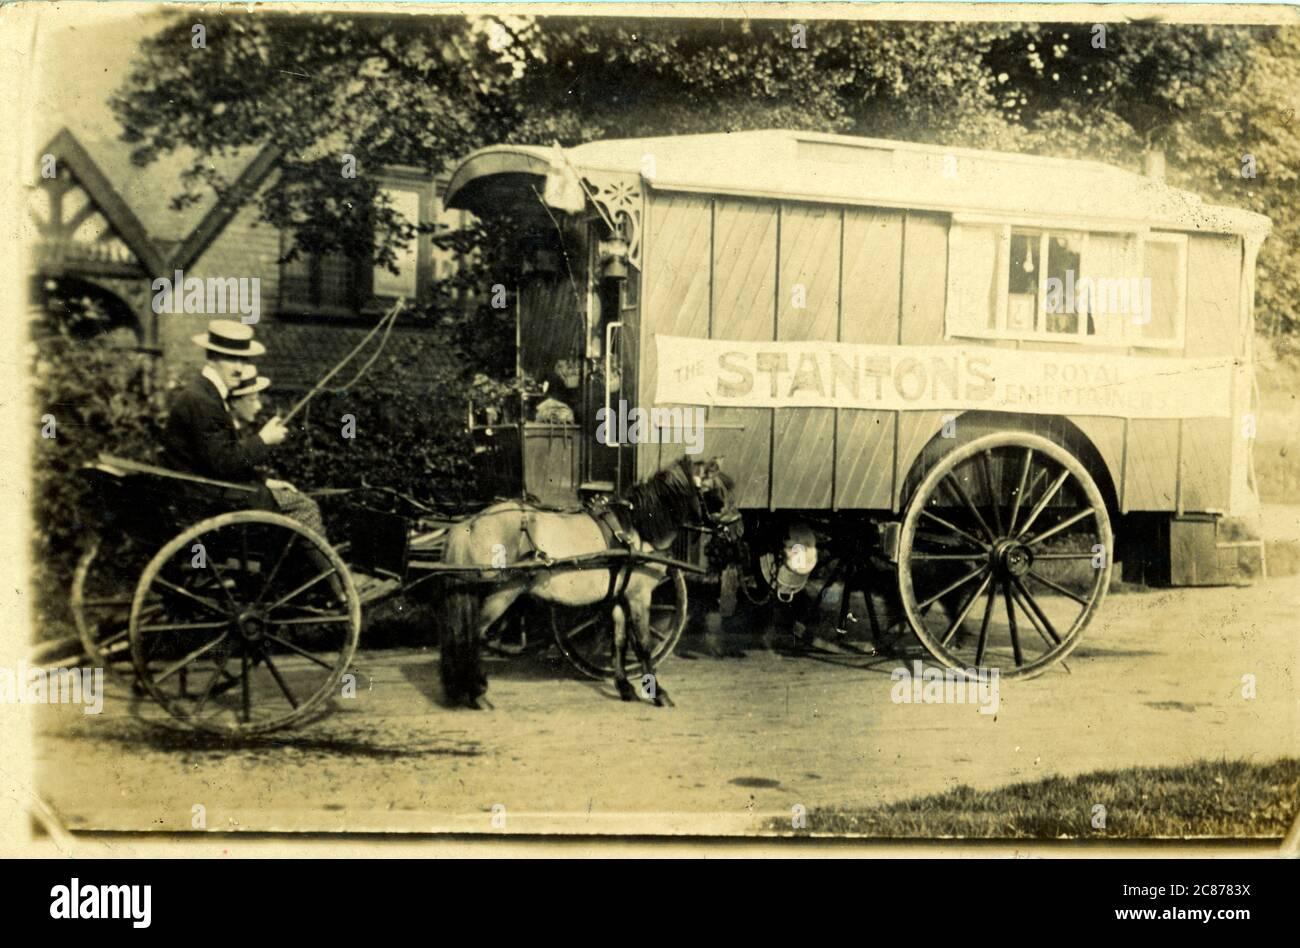 Vintage Caravan (Stanton's Royal Entertainers), Derby, Derbyshire, Inglaterra. Foto de stock